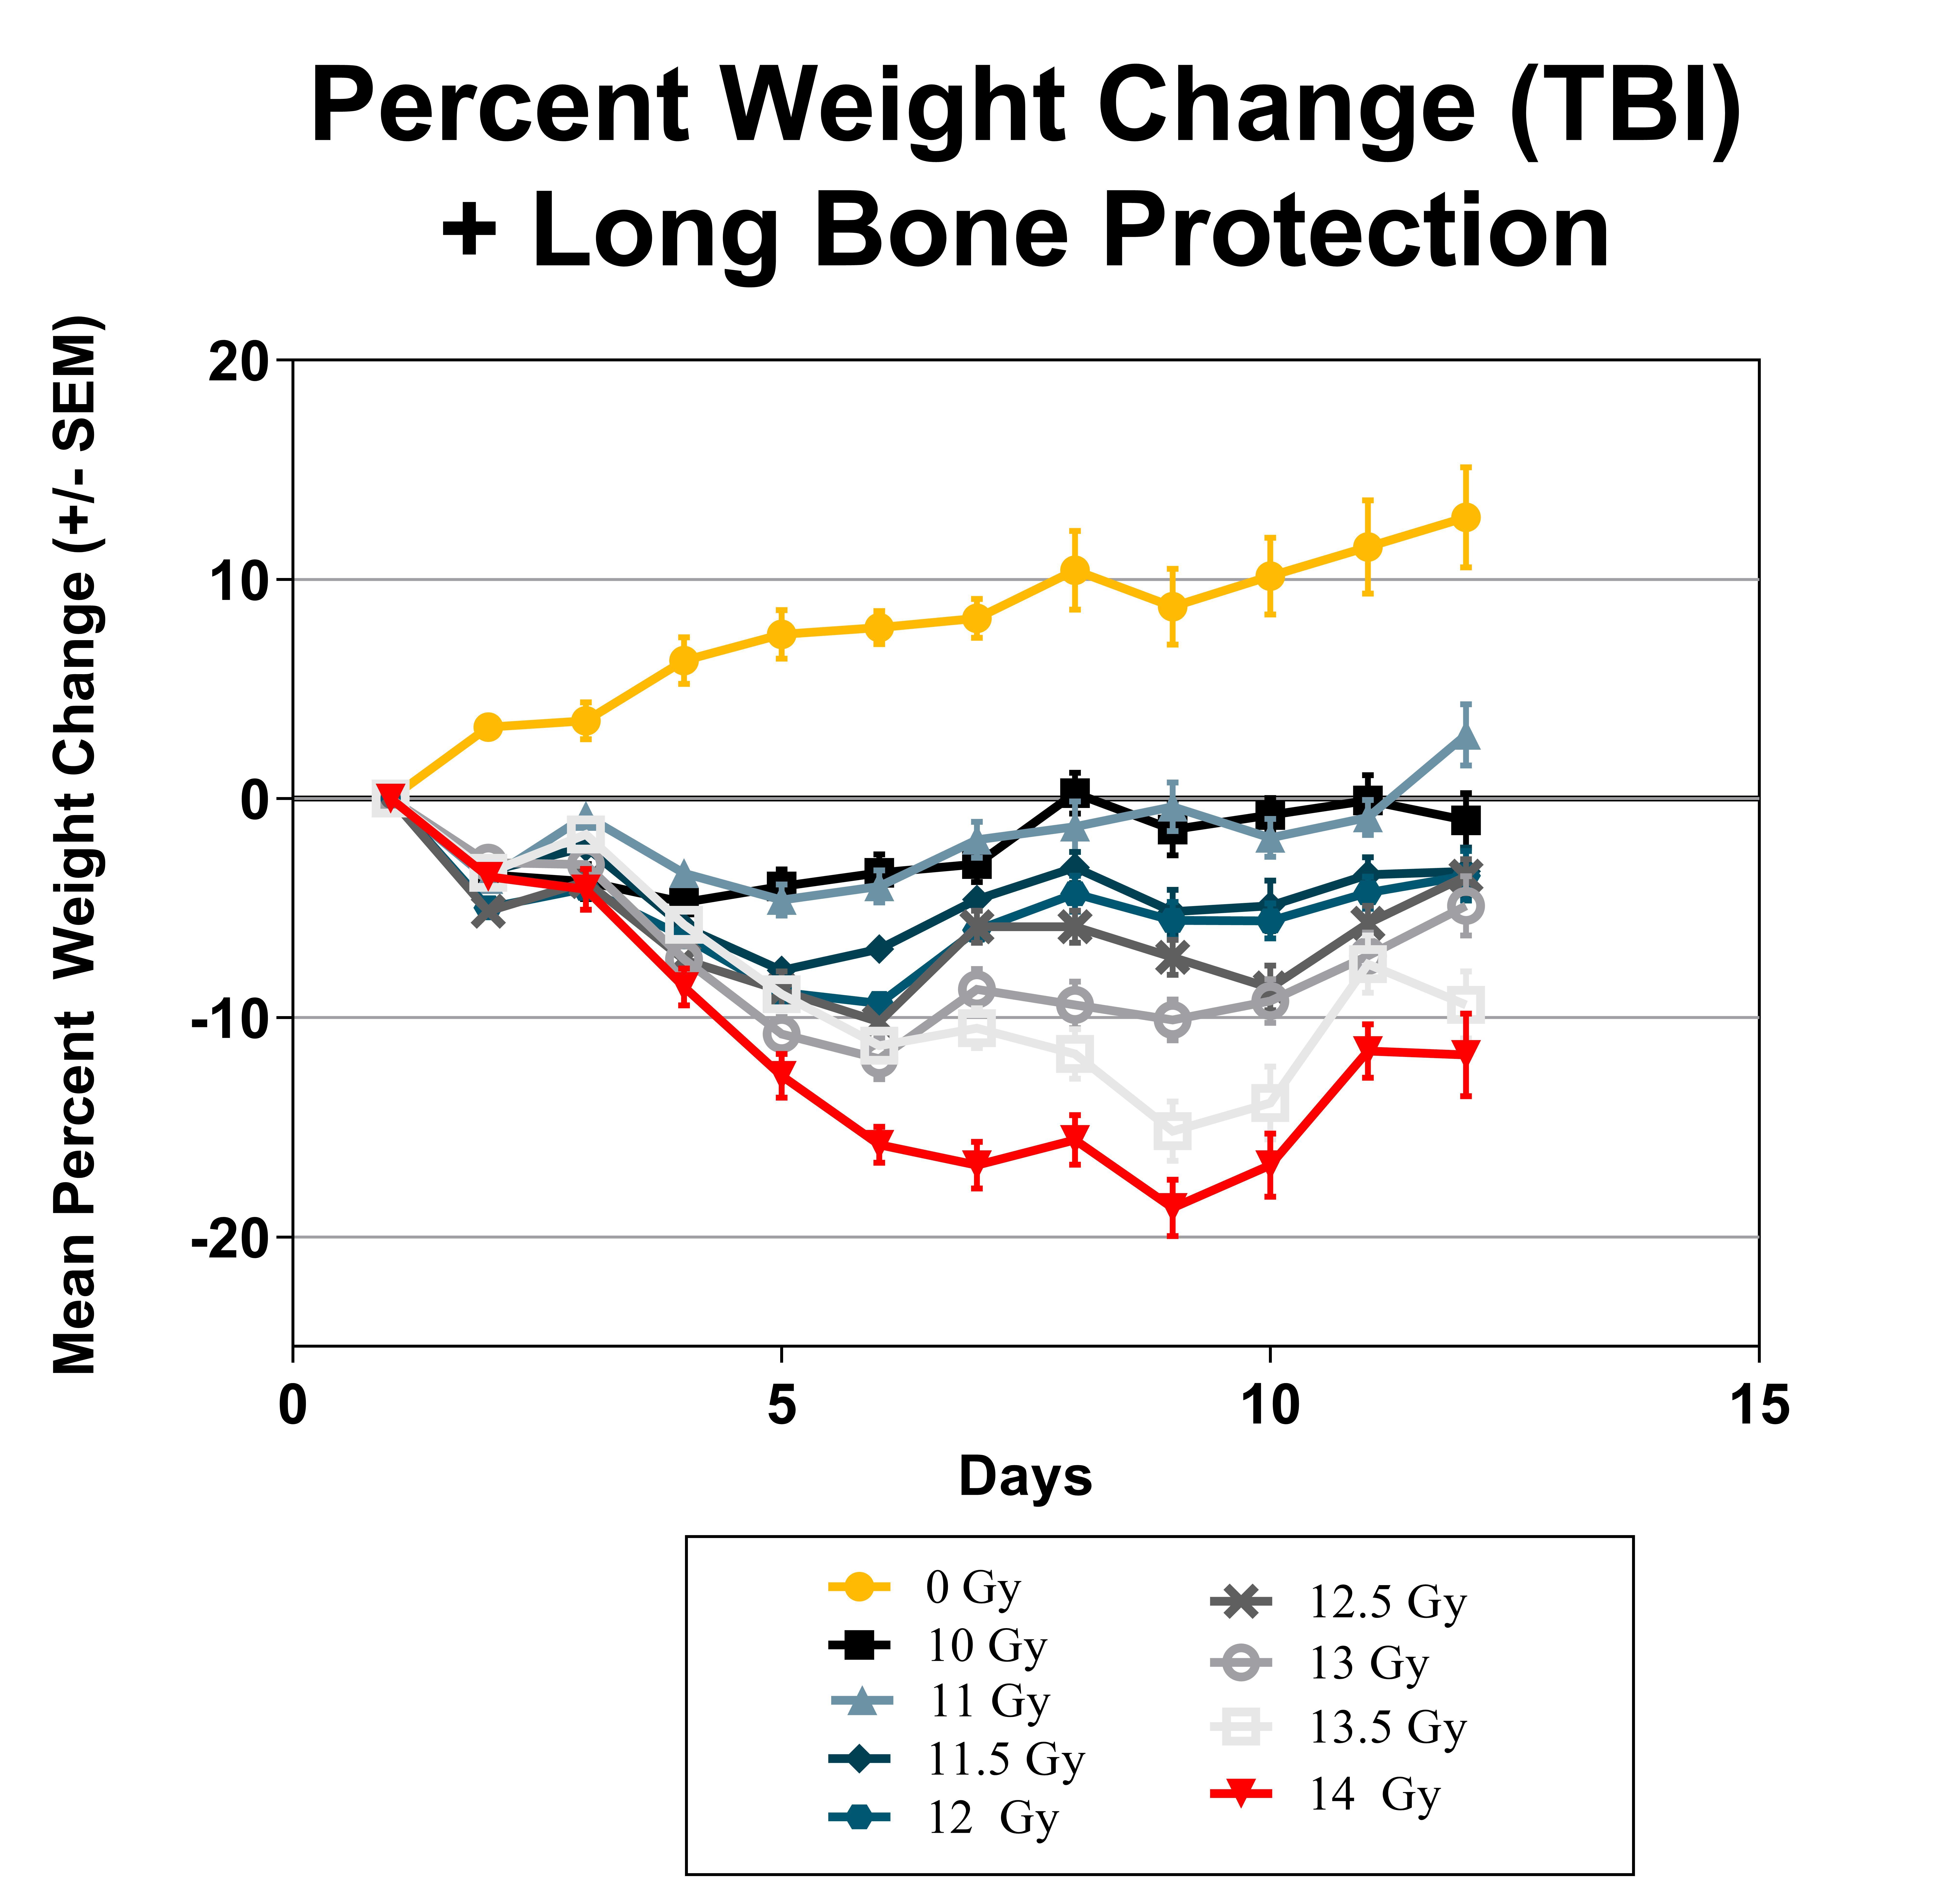 Percent Weight Change (TBI + Long Bone Protection)